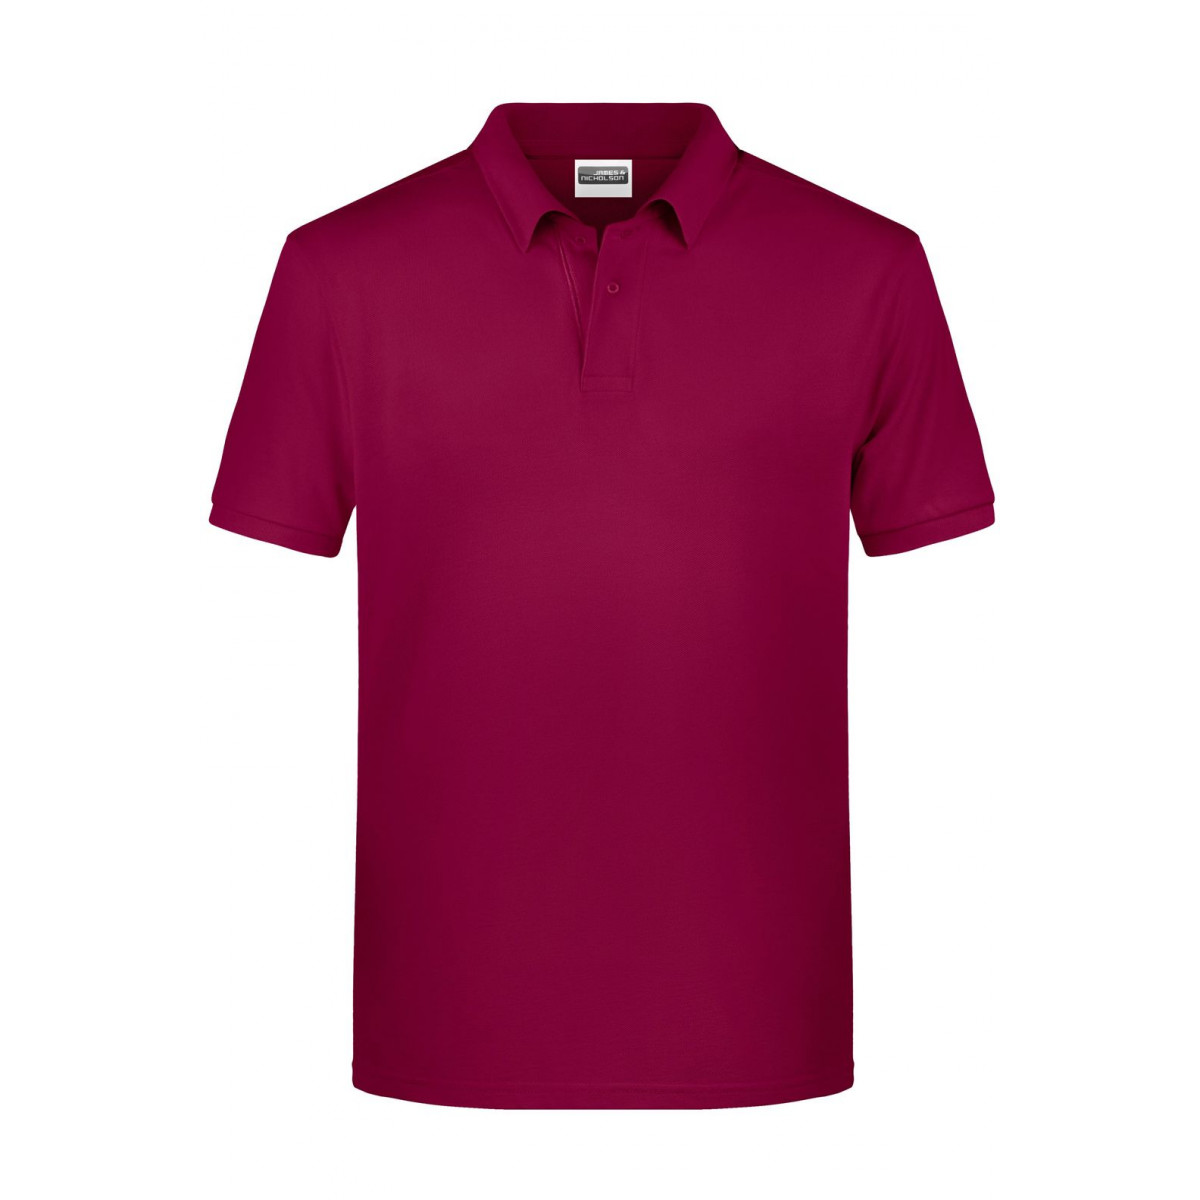 Рубашка поло мужская 8010 Mens Basic Polo - Бордовый